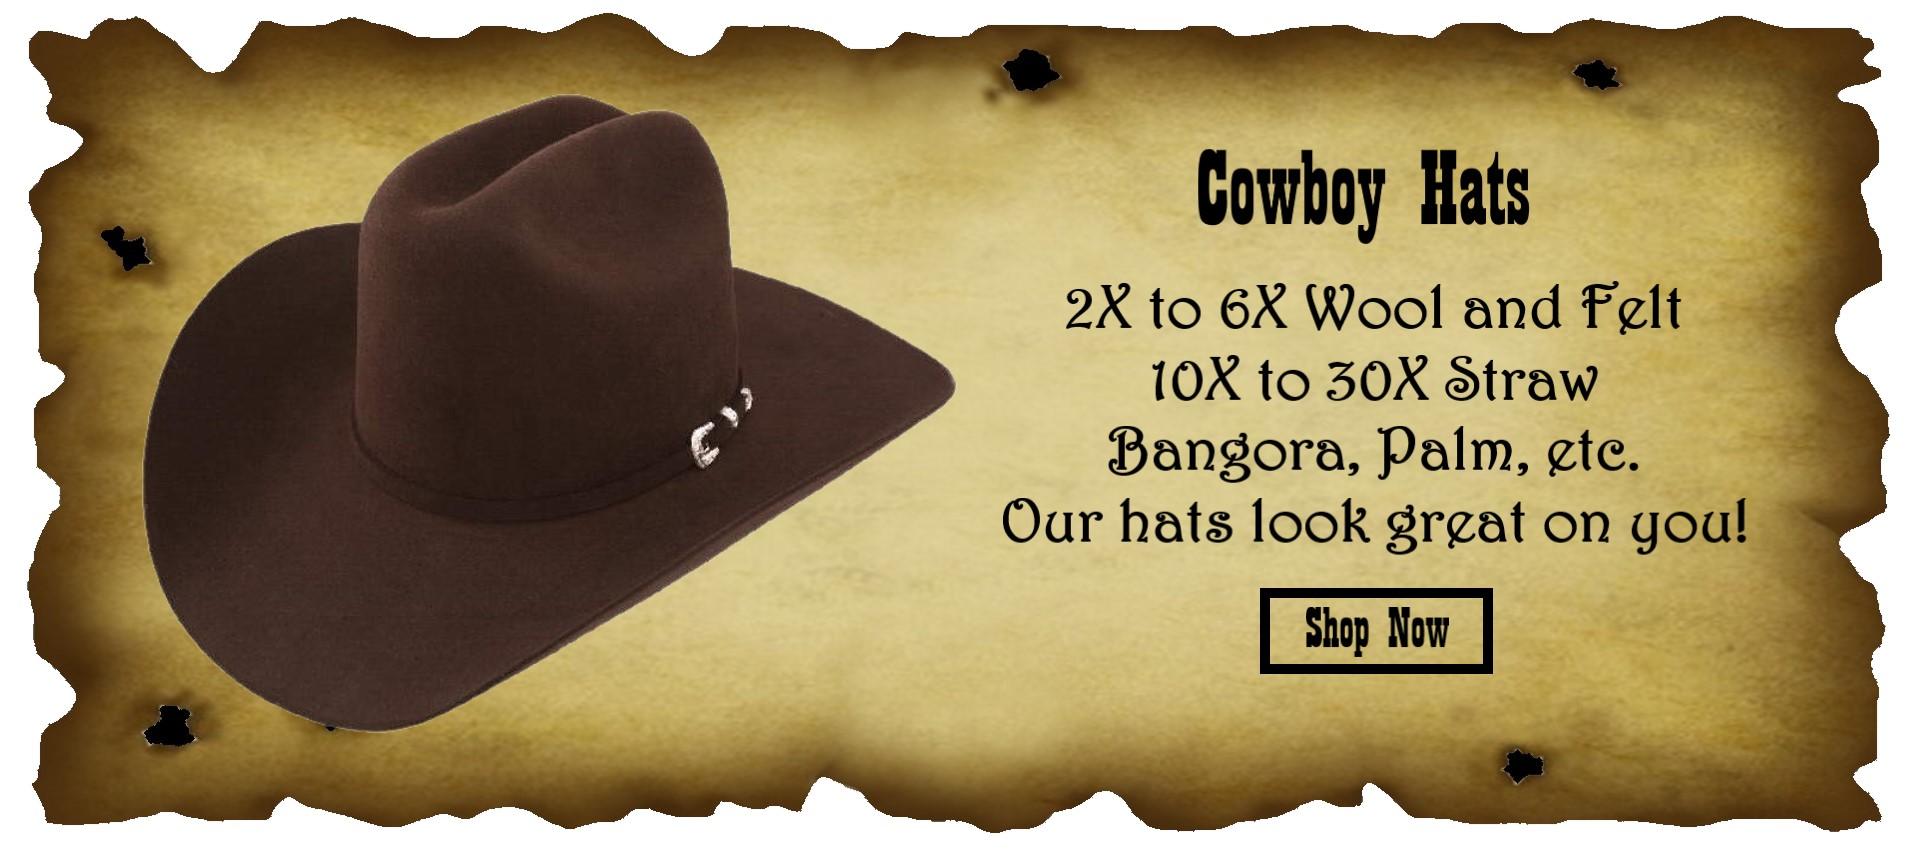 Cowboy Hats Slider